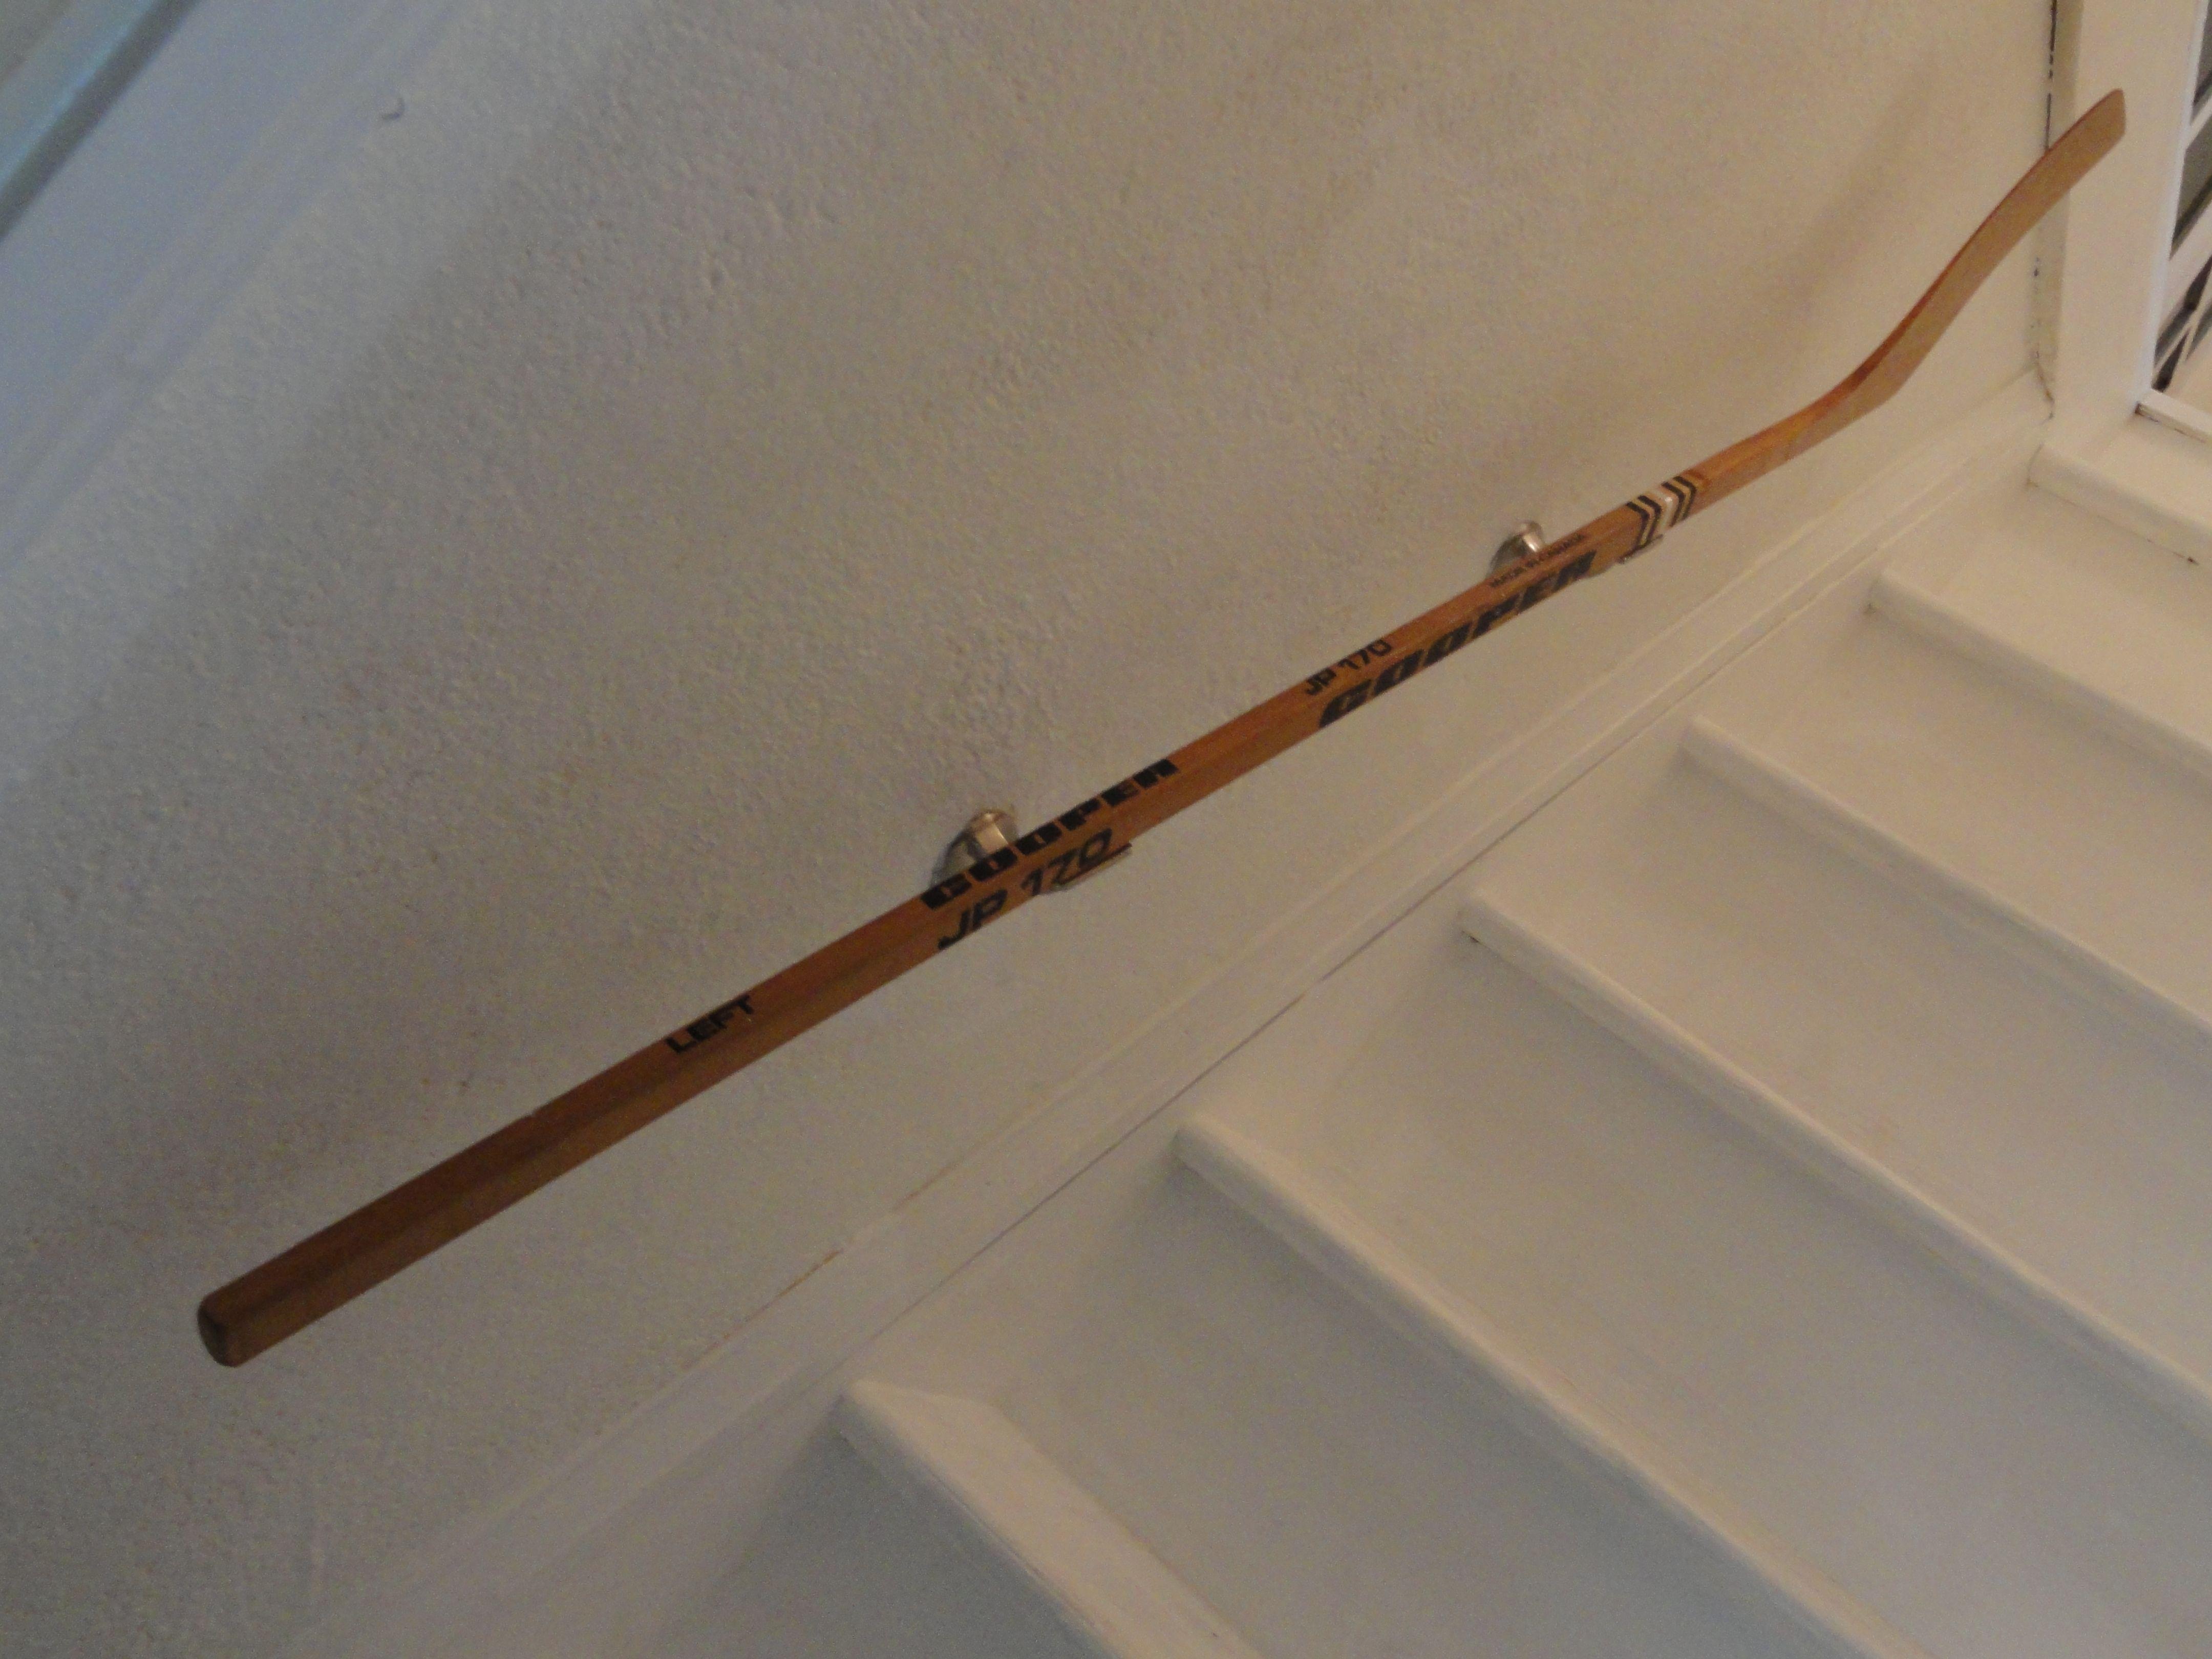 Pin By Samantha Kennett On For The Home Hockey Room Hockey Decor Hockey Stick